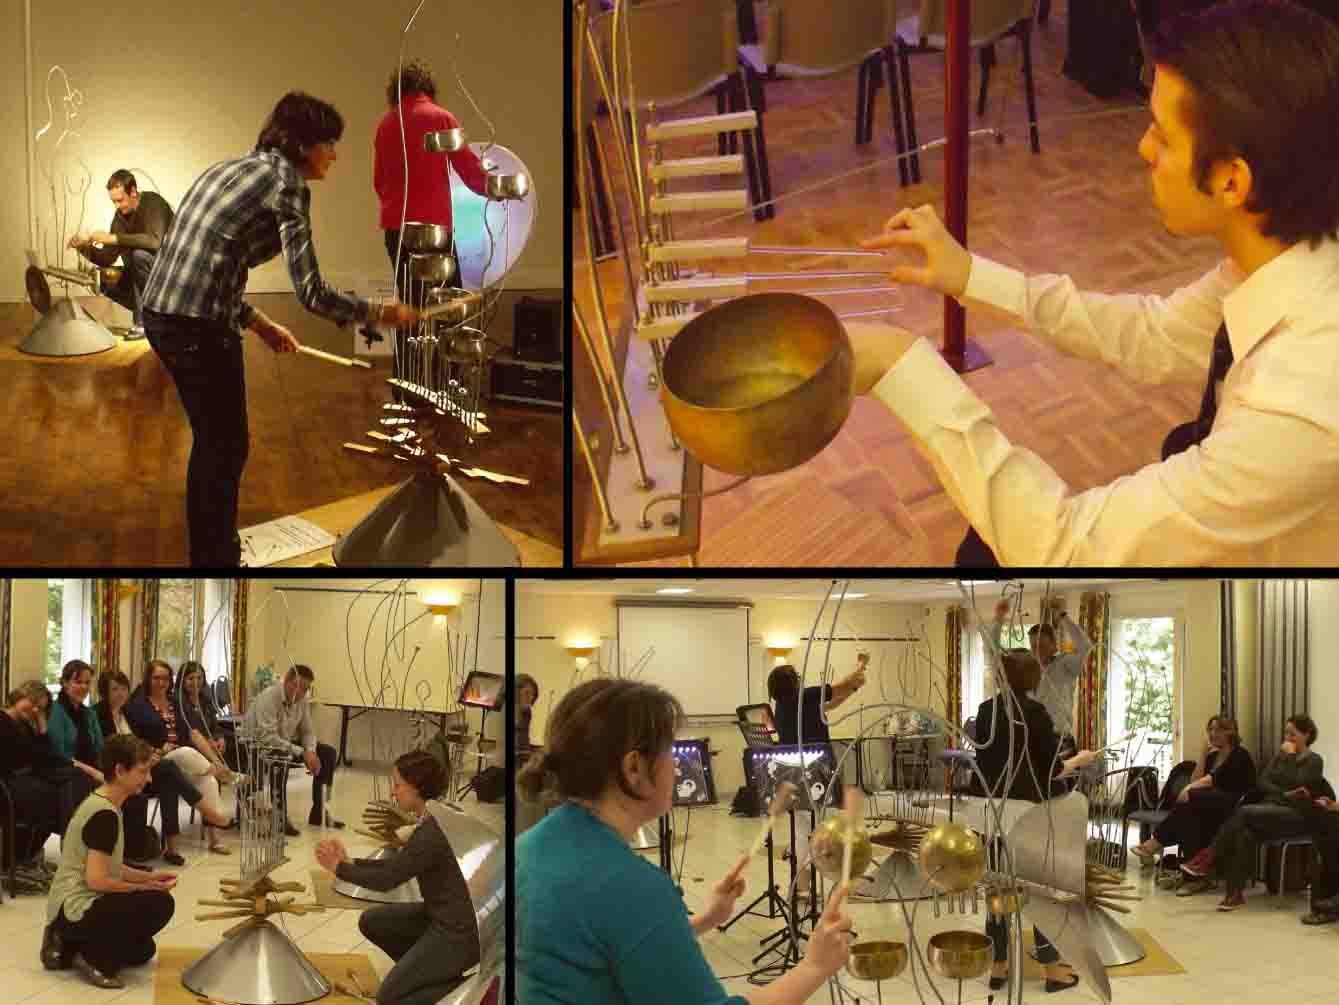 animation team building musical